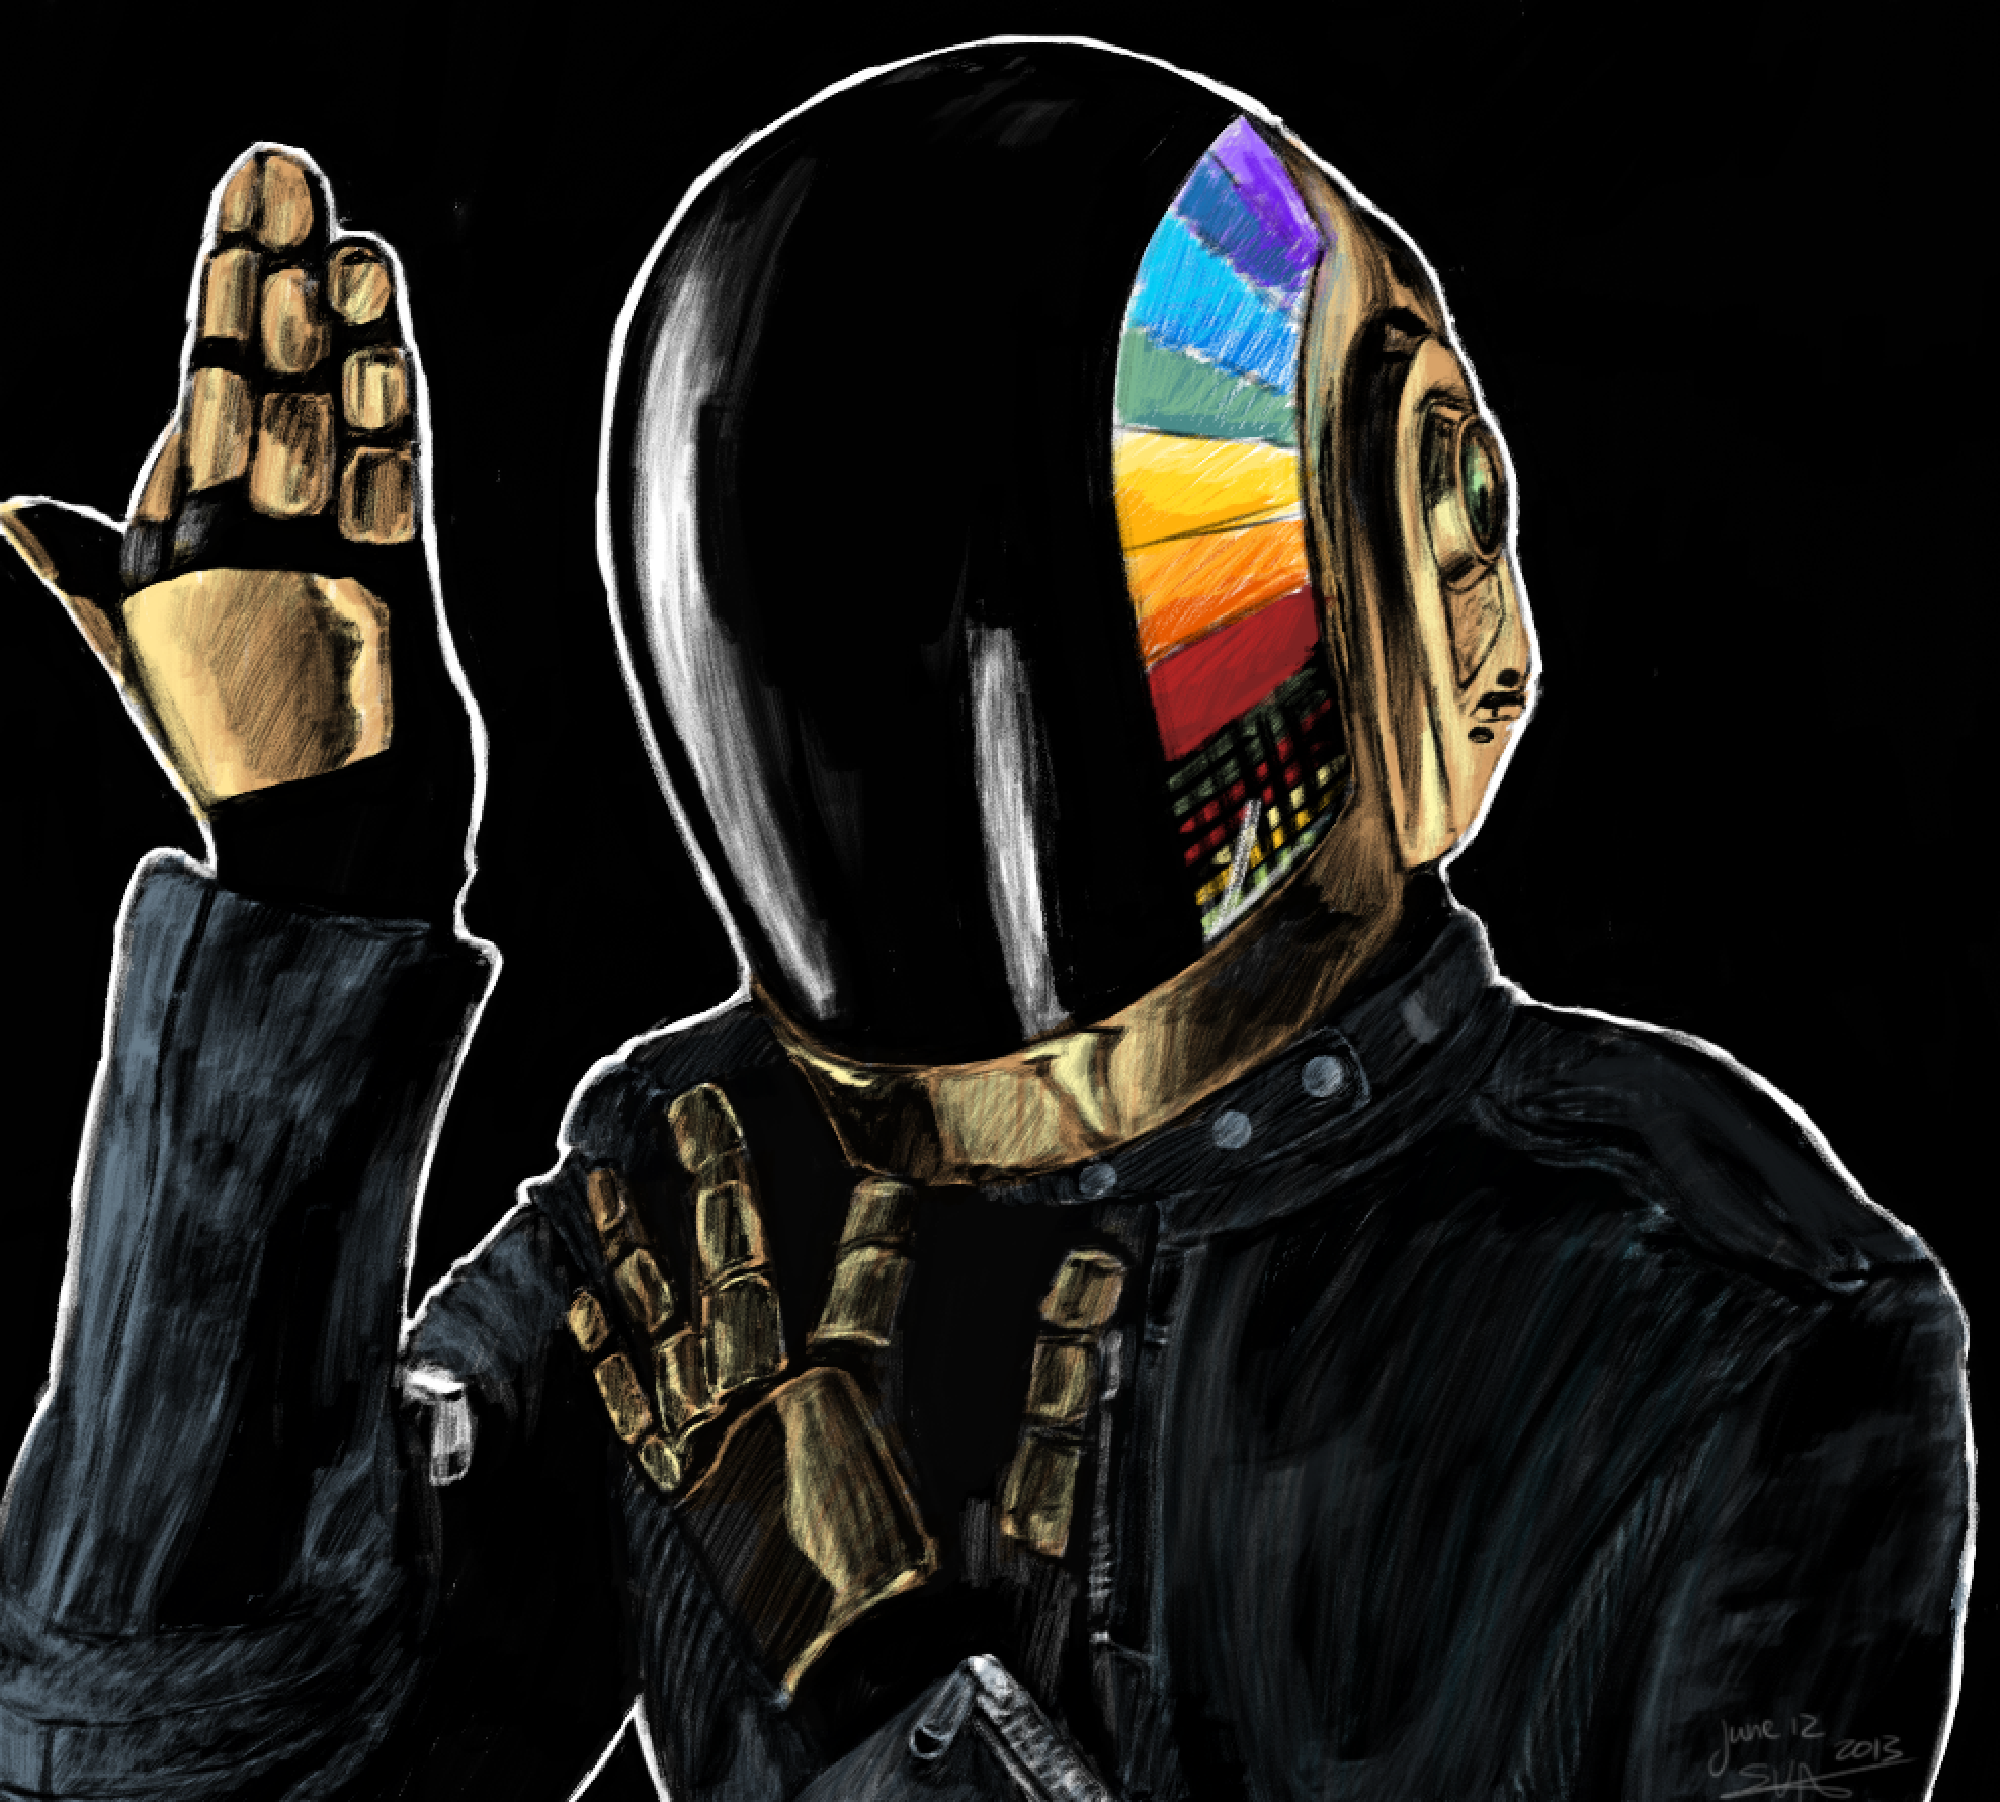 Daft Punk 1 By Deathpixels On Deviantart